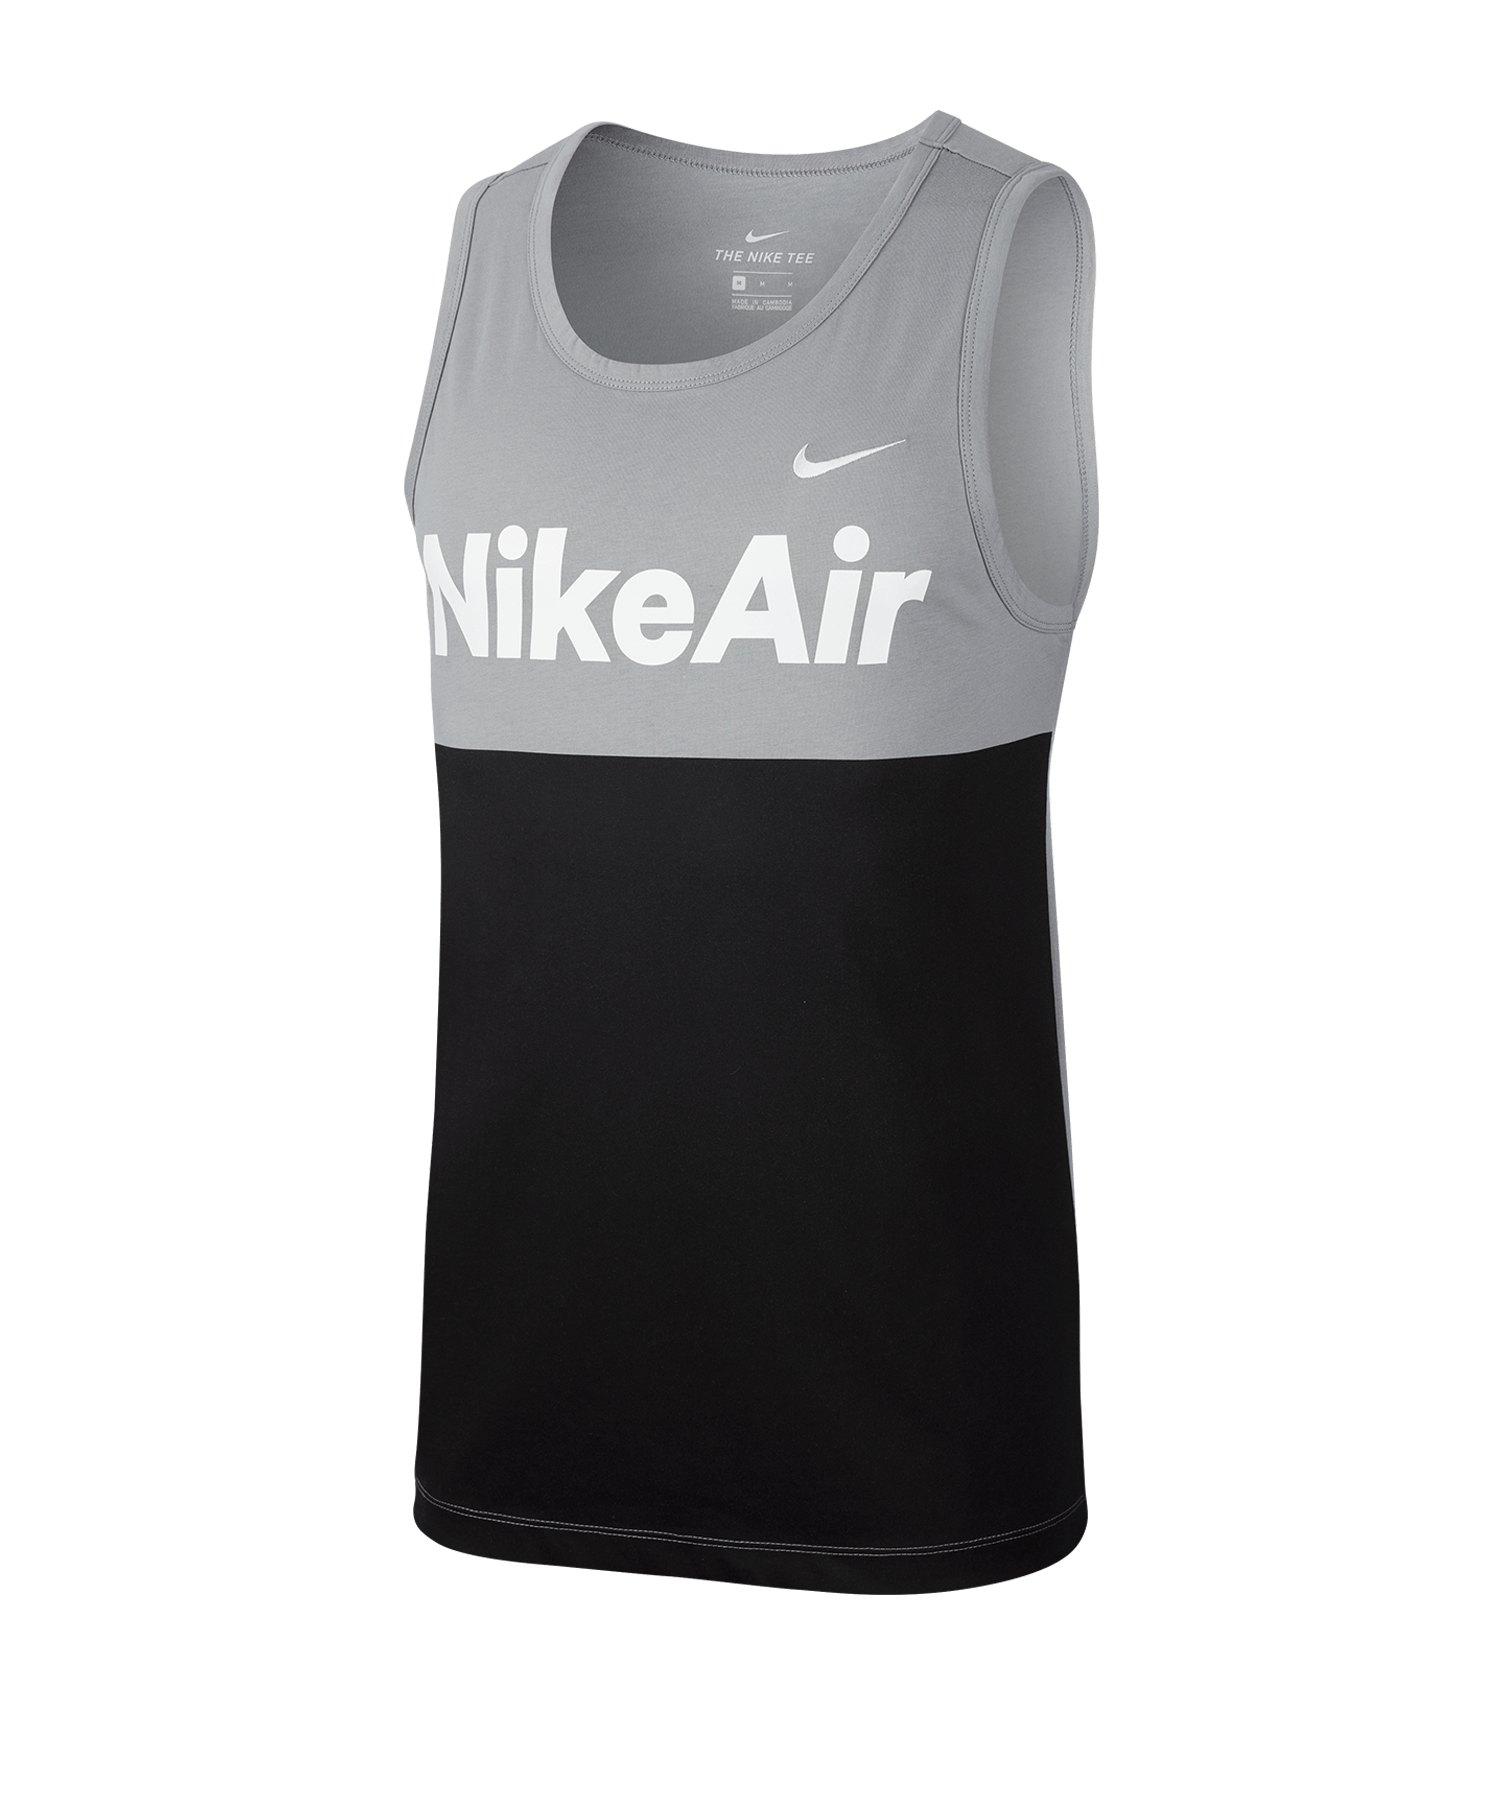 Nike Air Tanktop Schwarz Grau F073 - grau